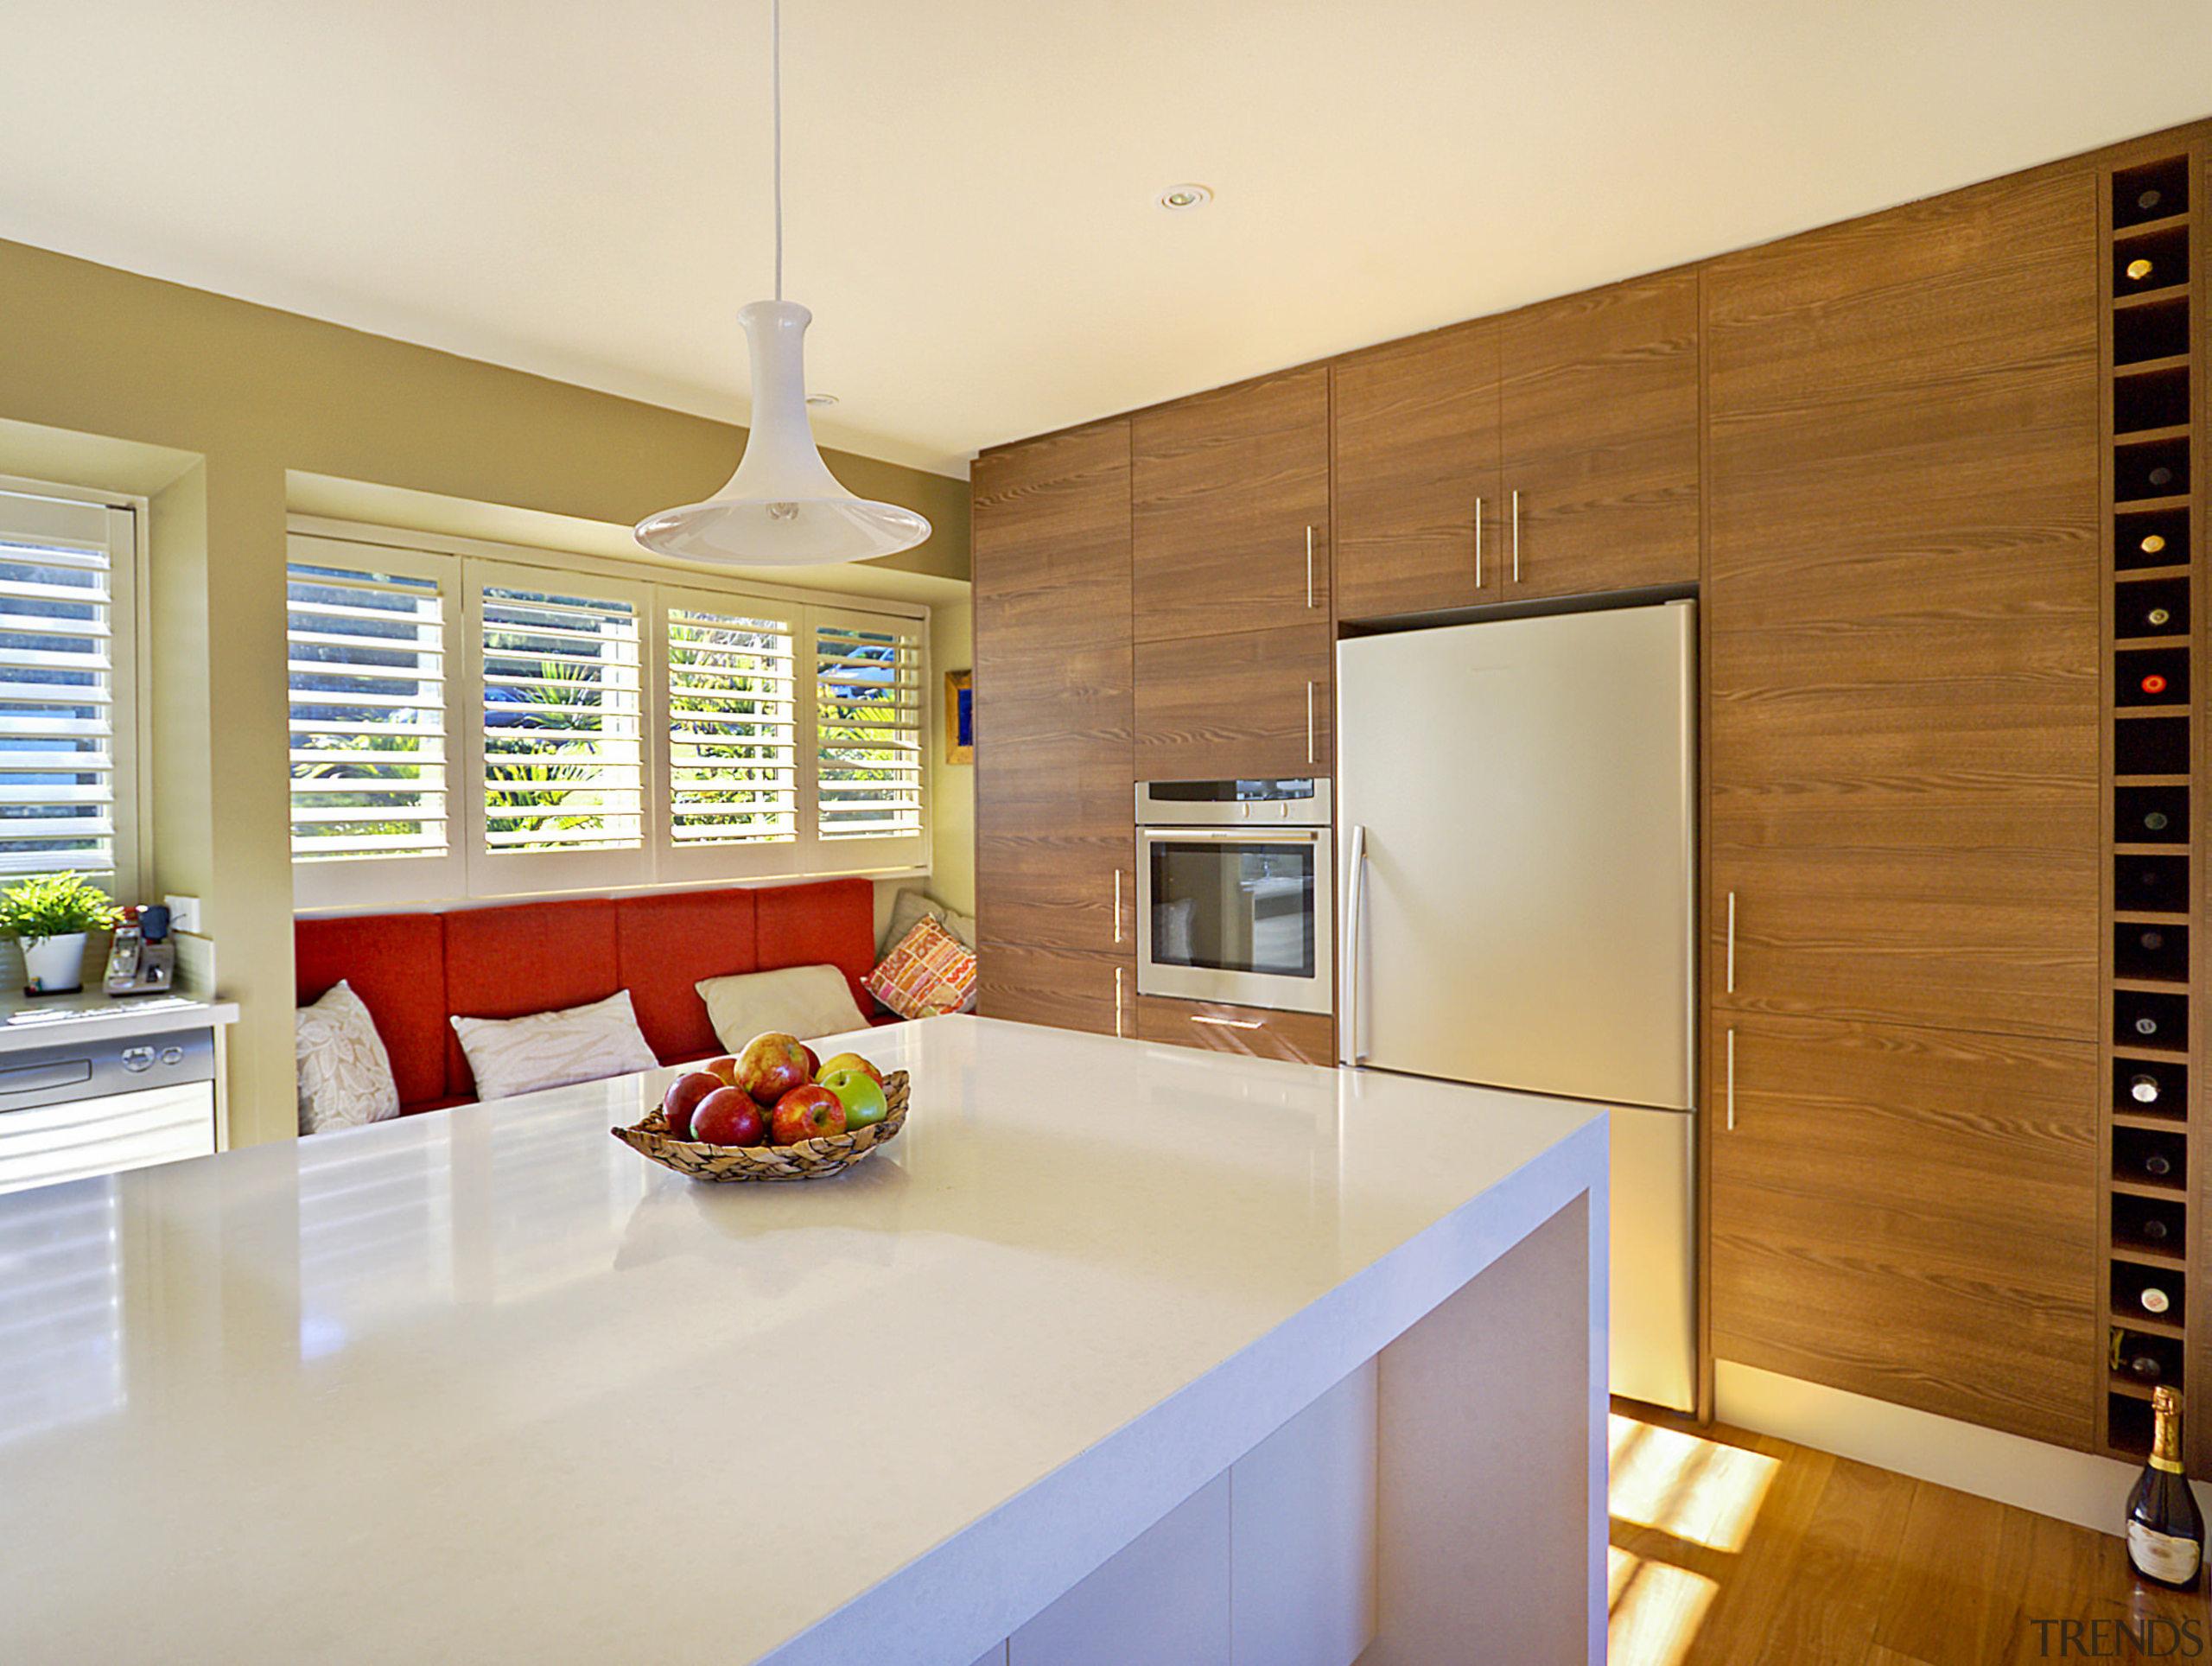 View of kitchen featuring wood floors, white bench countertop, interior design, kitchen, real estate, room, orange, brown